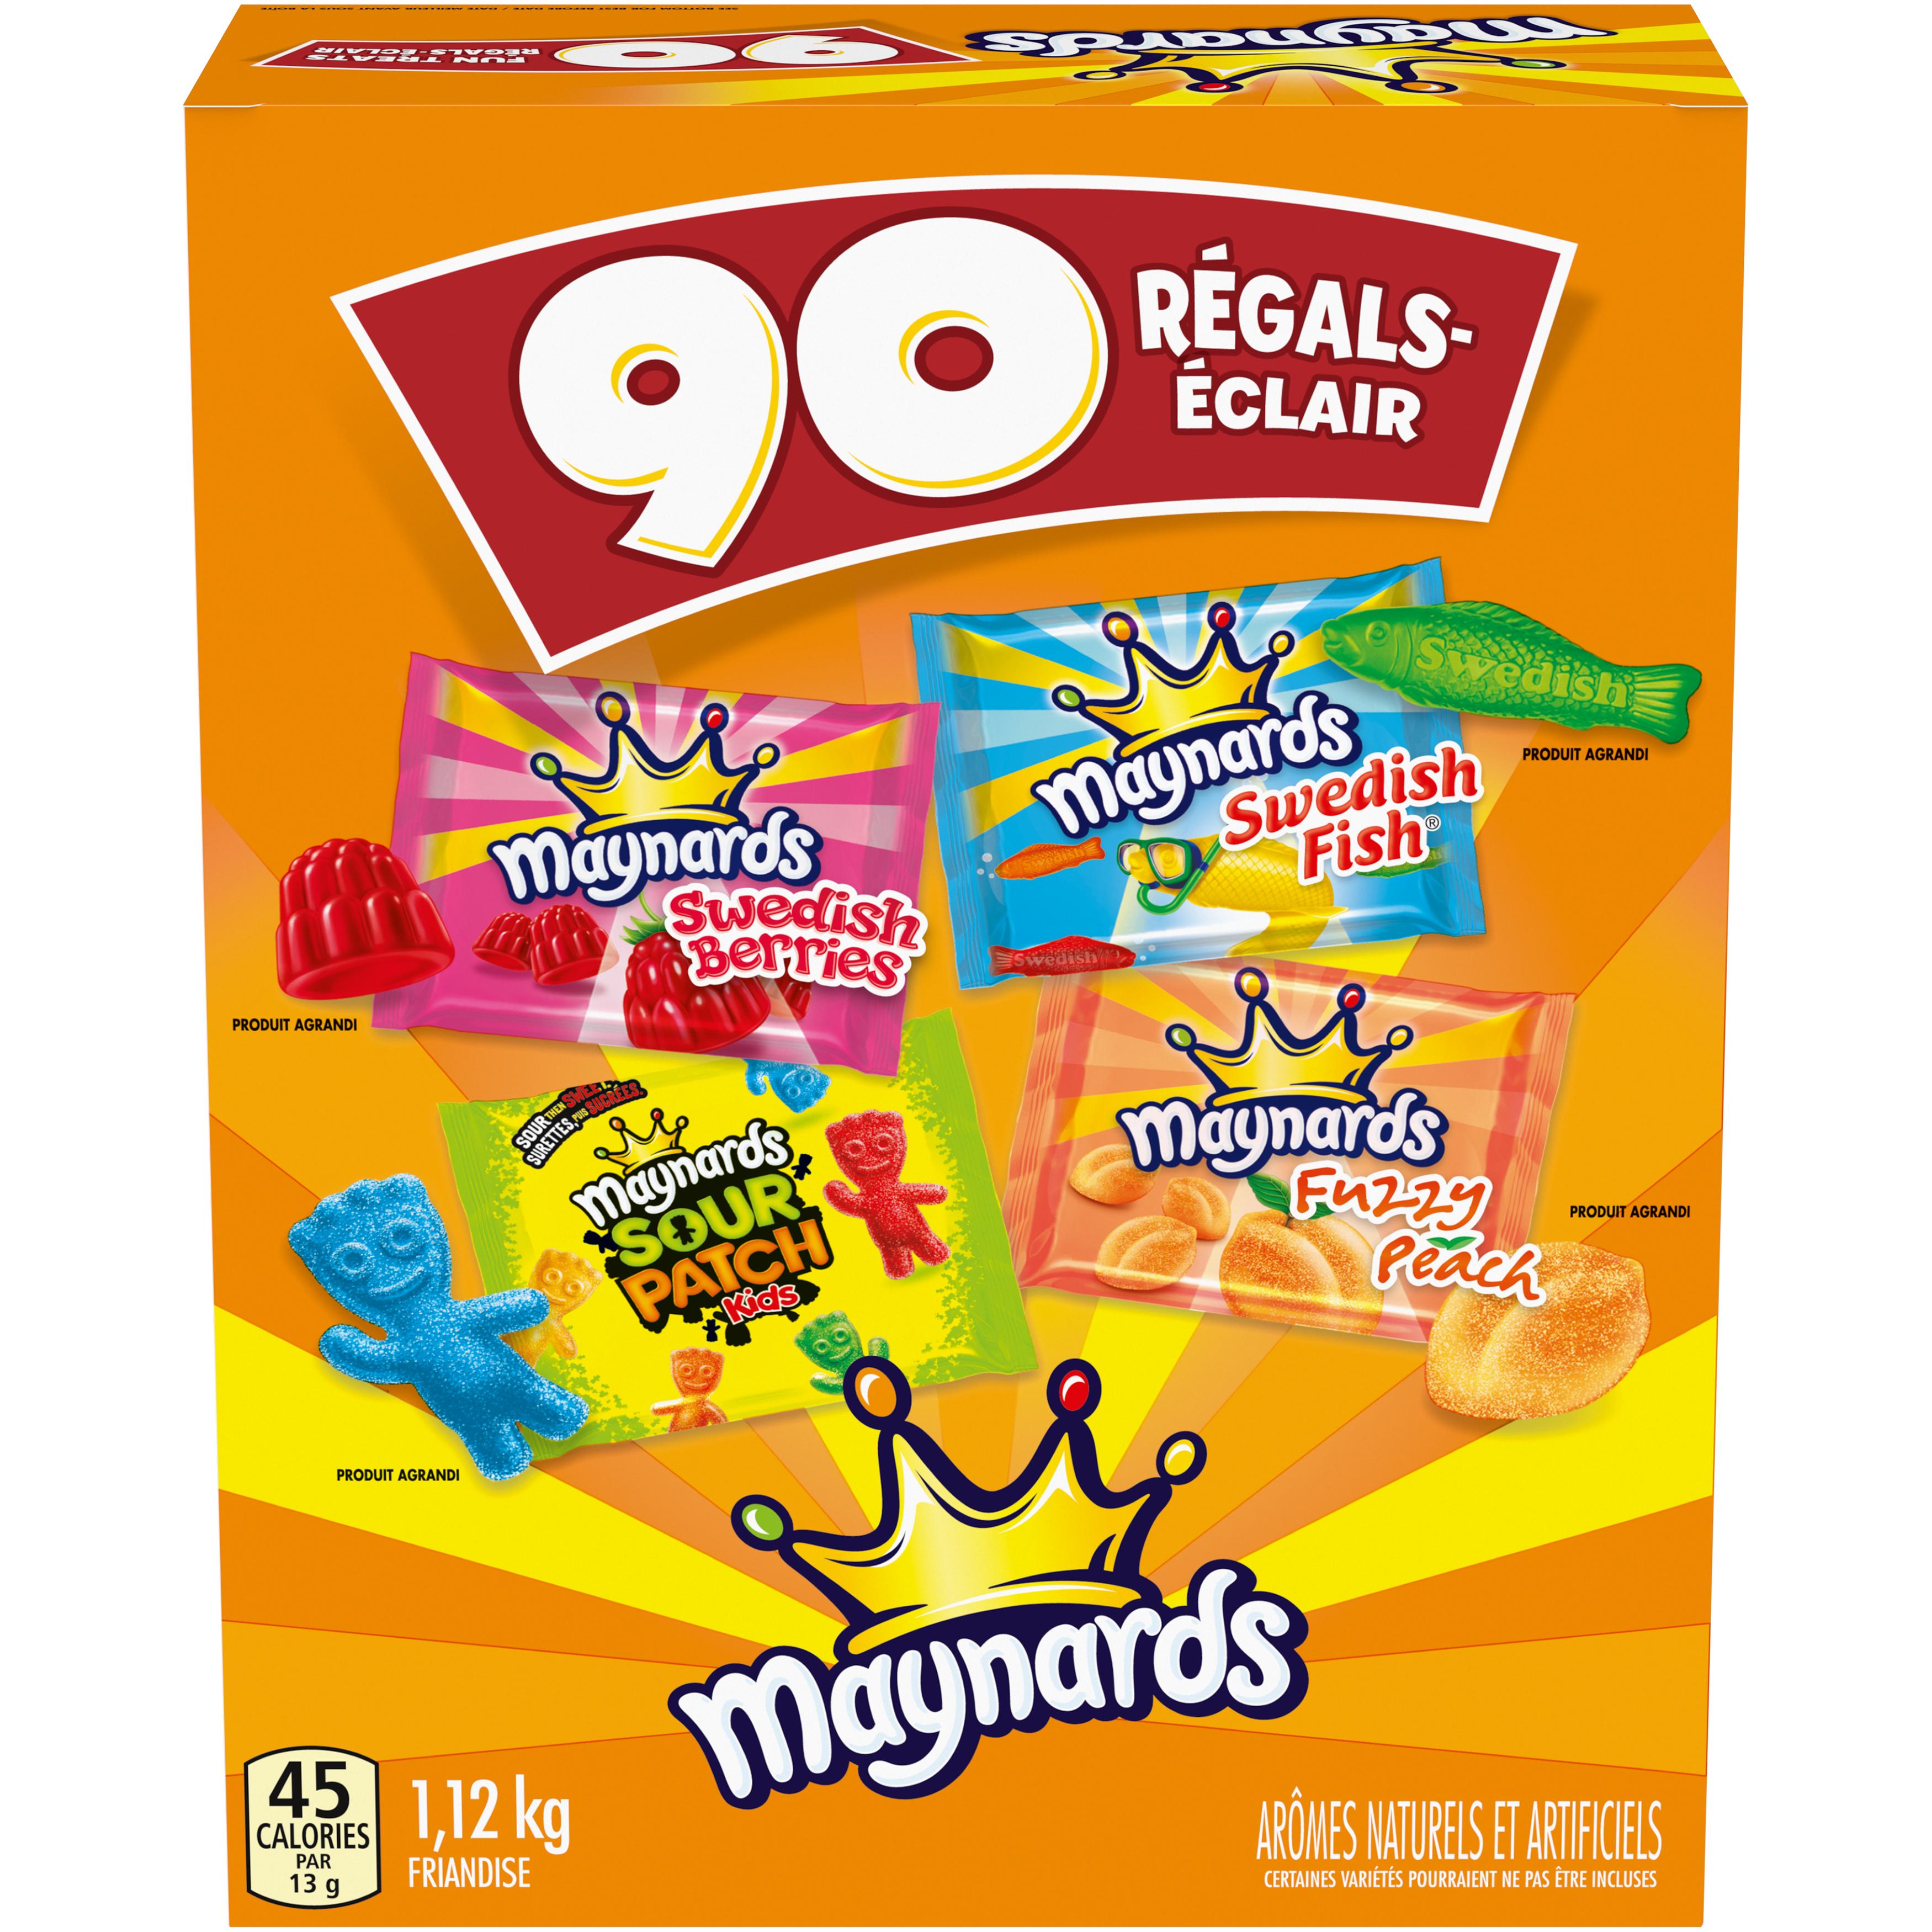 Maynards Crossbrands Fun Treats Soft Candy 1.12 KG